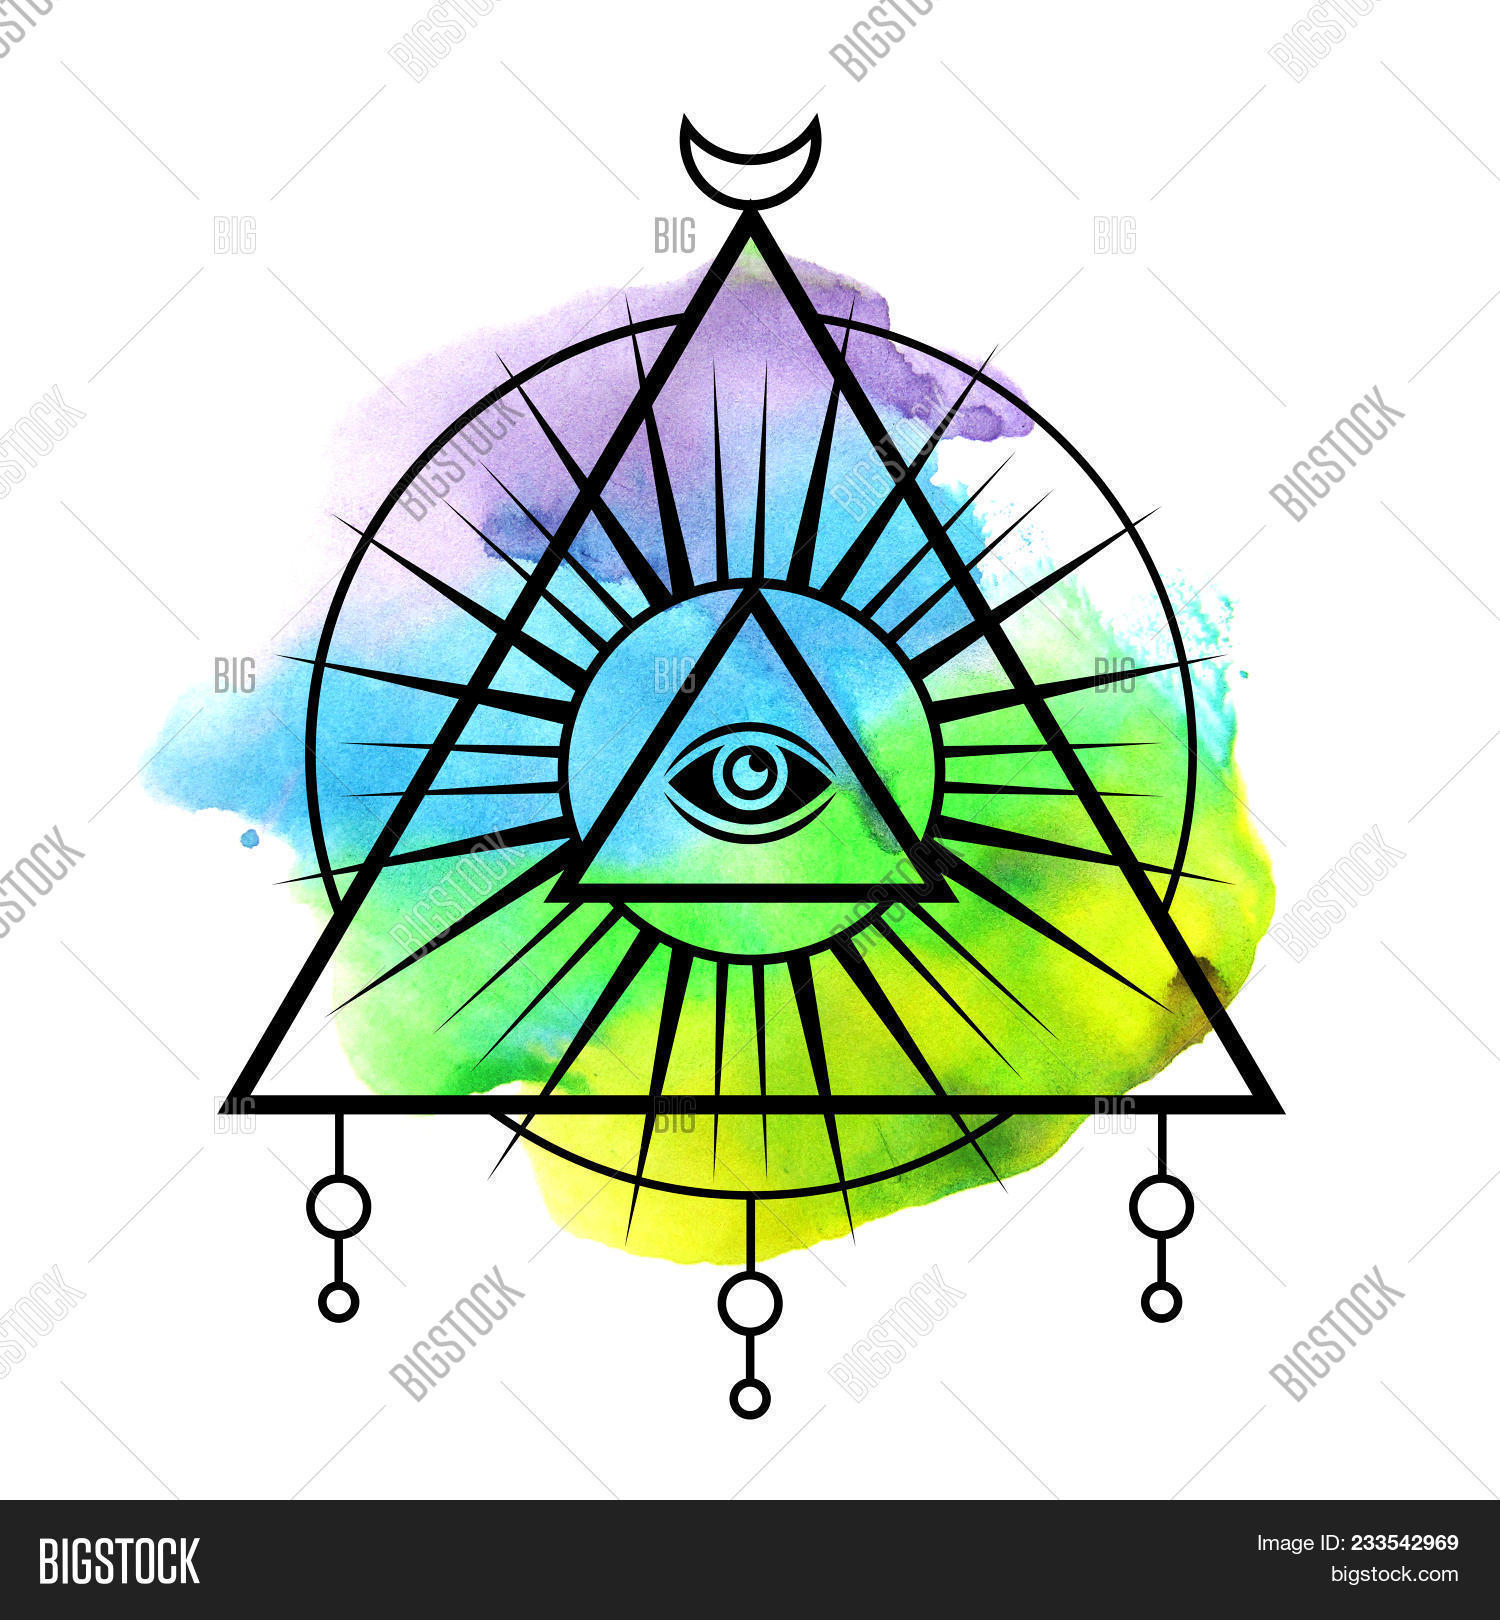 All Seeing Eye Symbol Image Photo Free Trial Bigstock